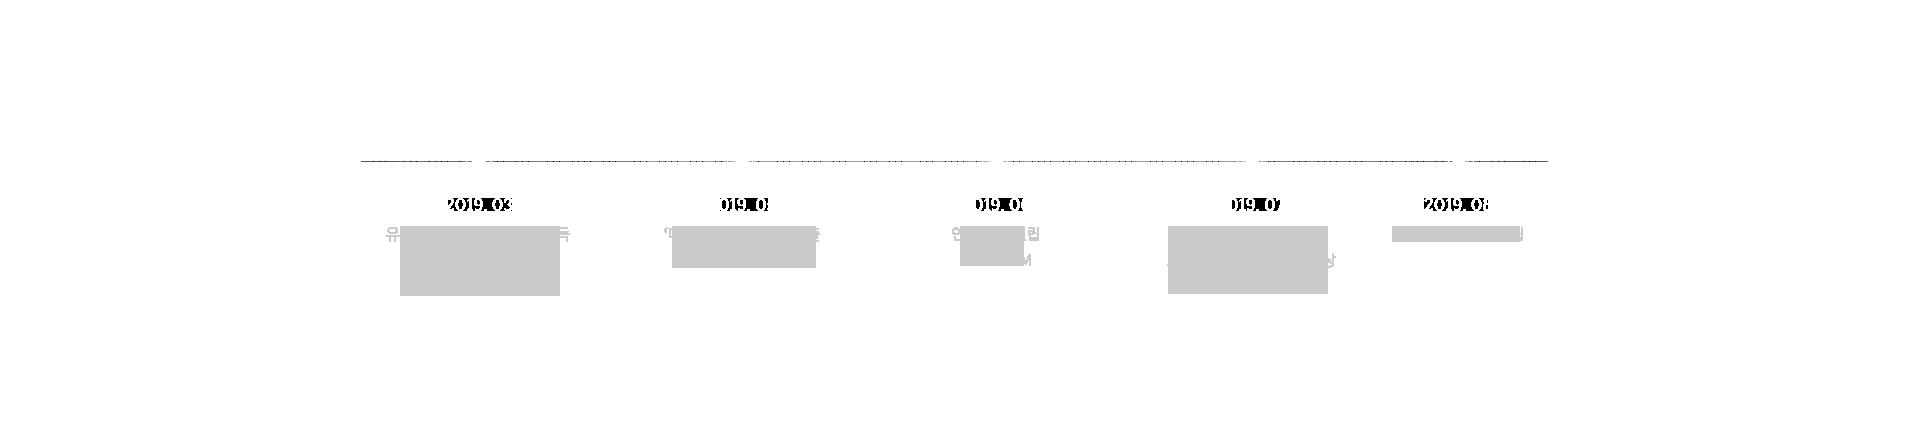 history_2019